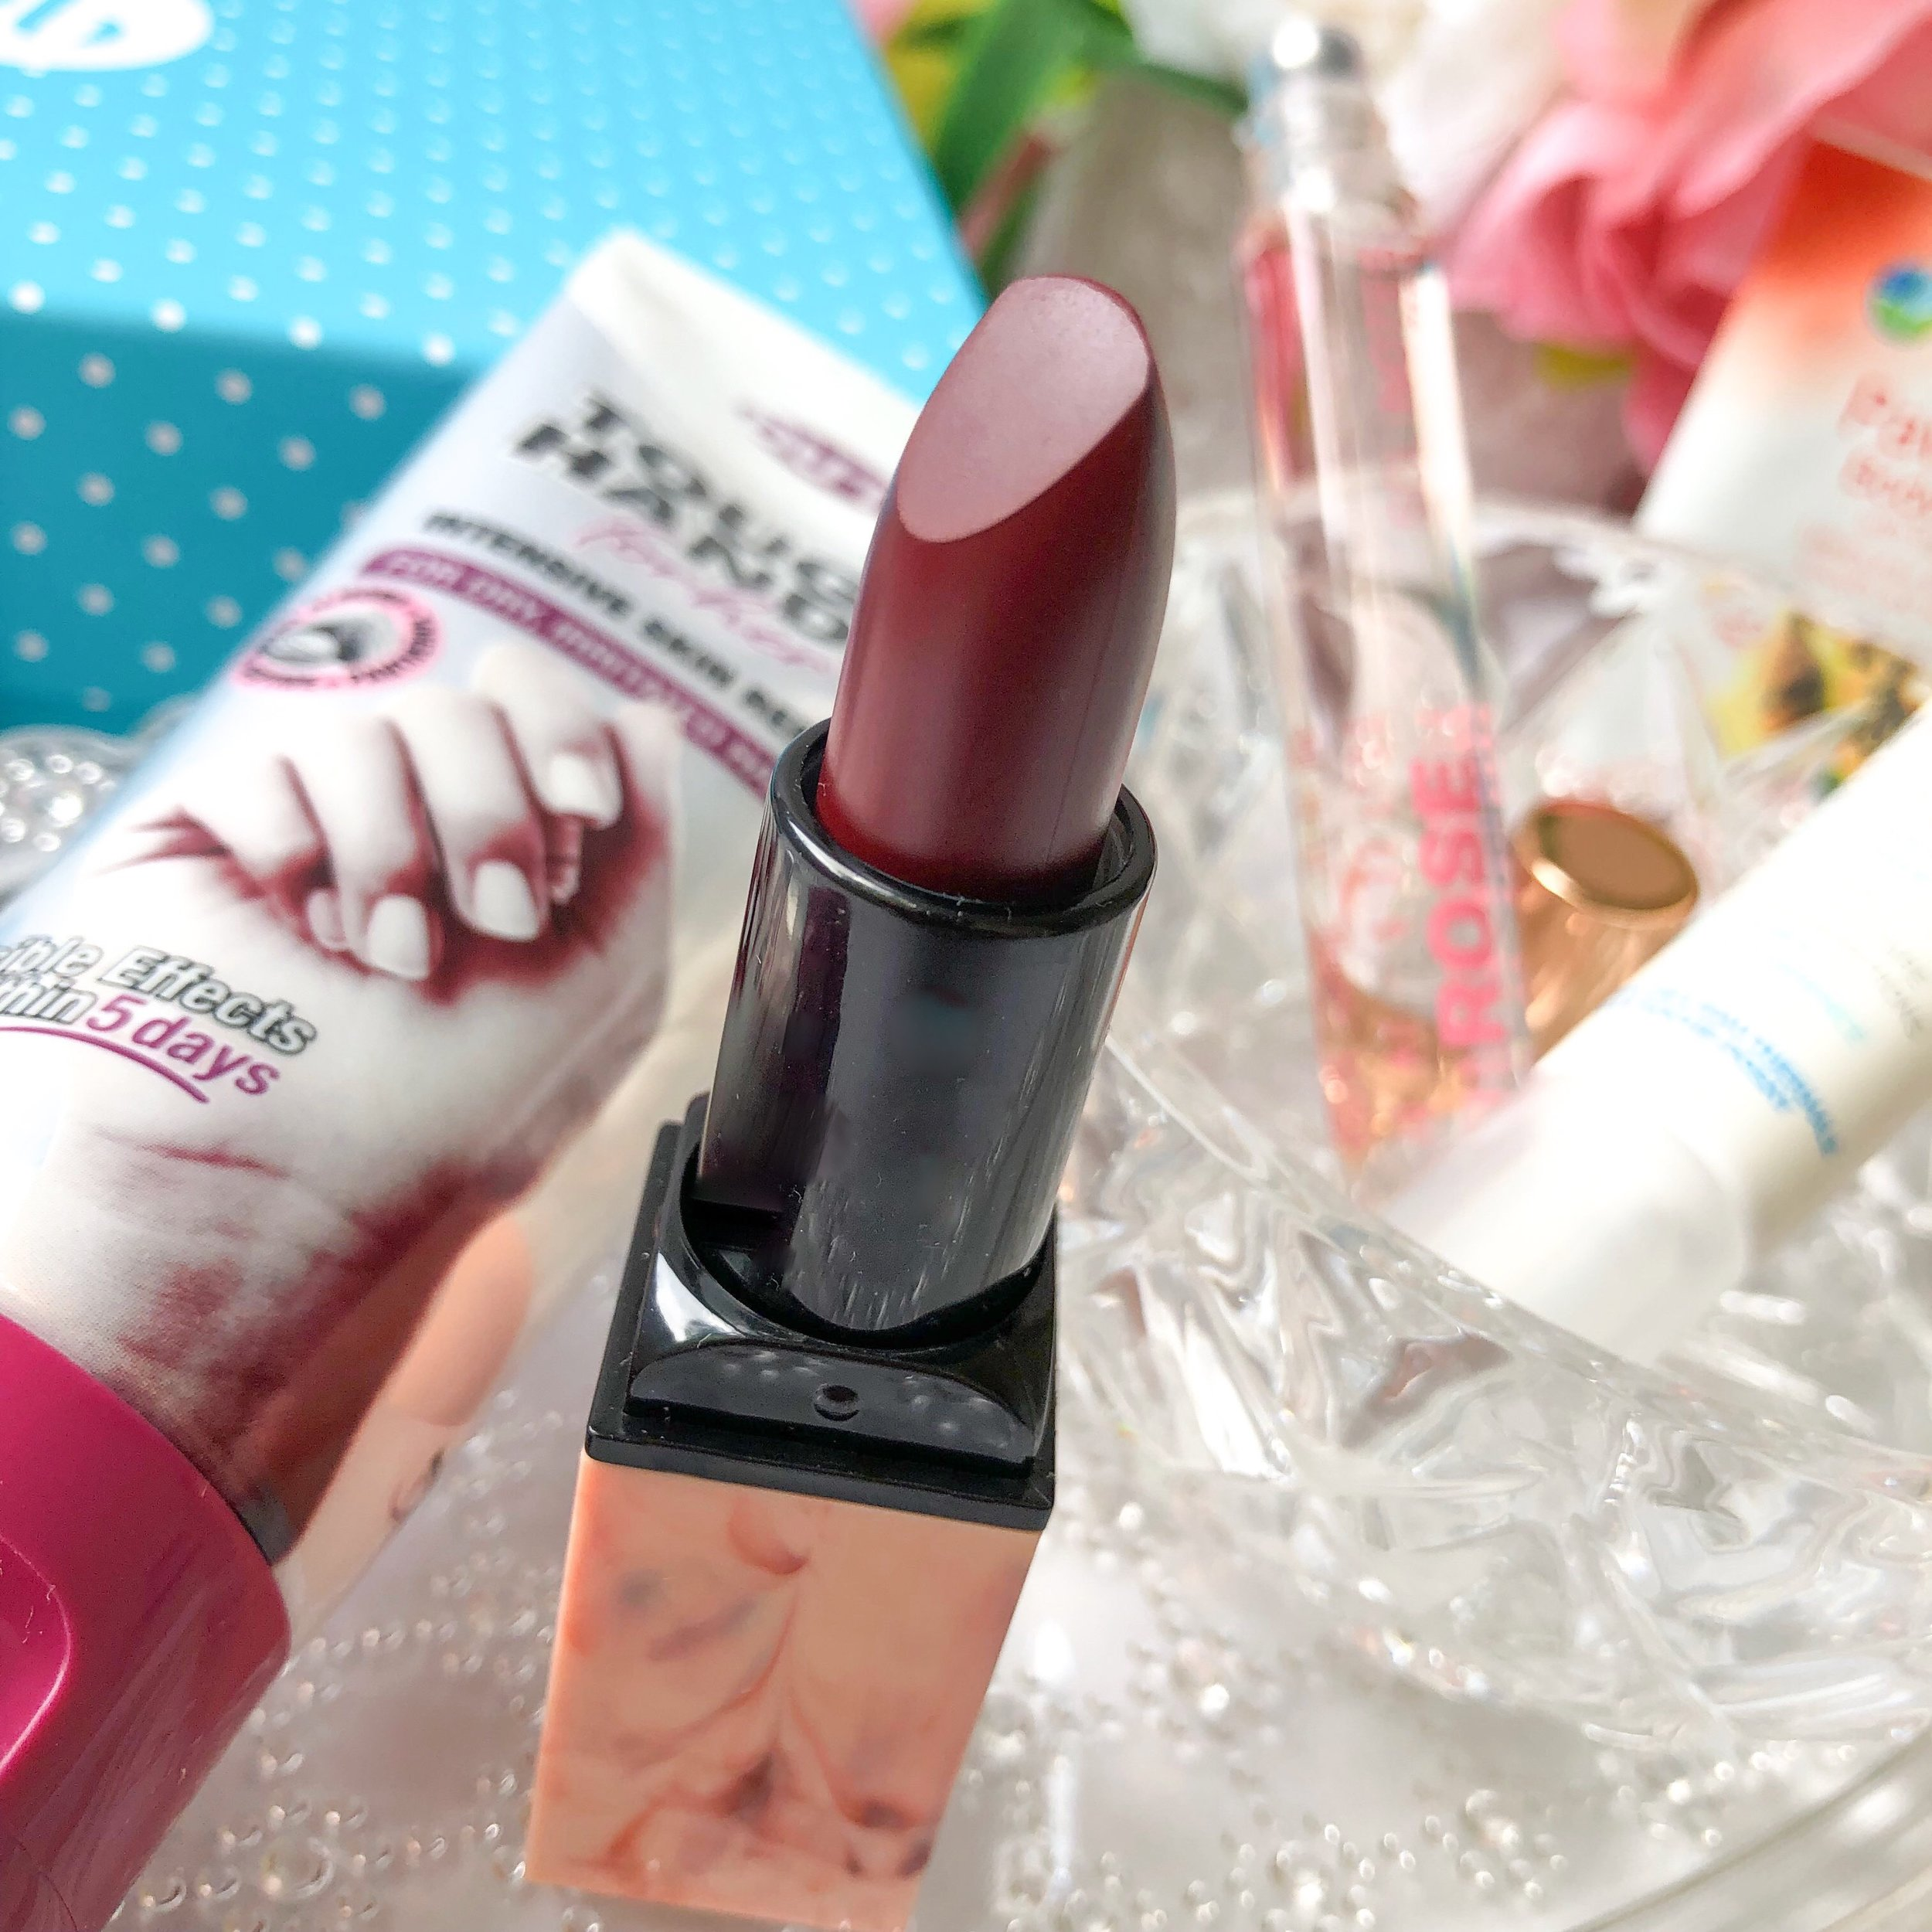 STYL London Lipstick.jpg